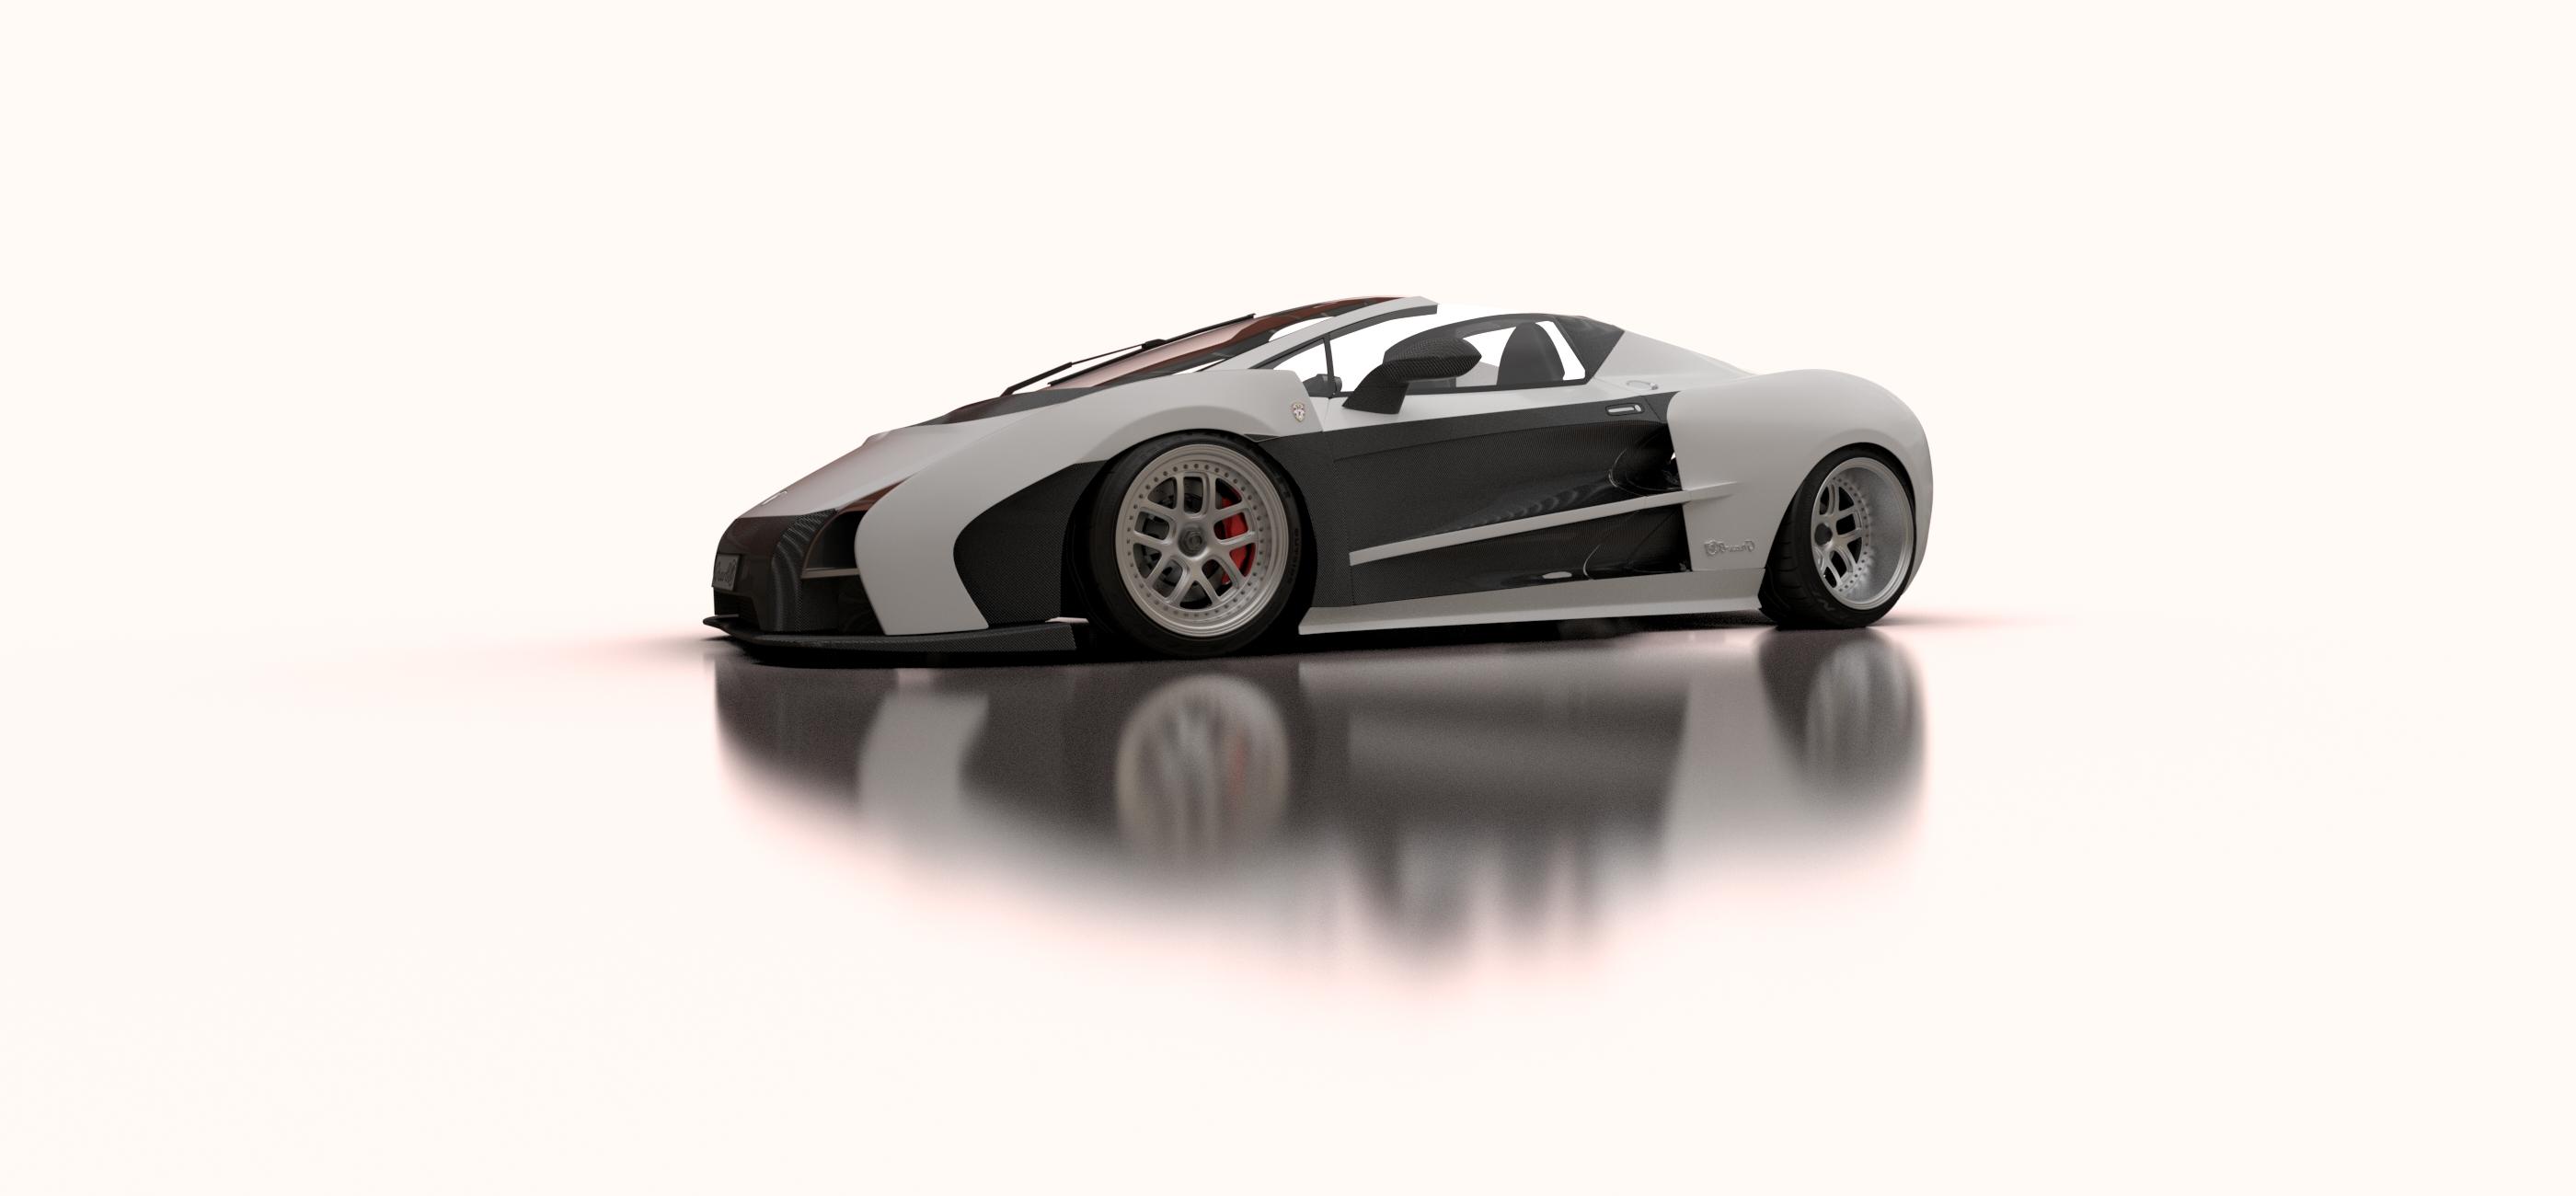 V2 Carbon Edition